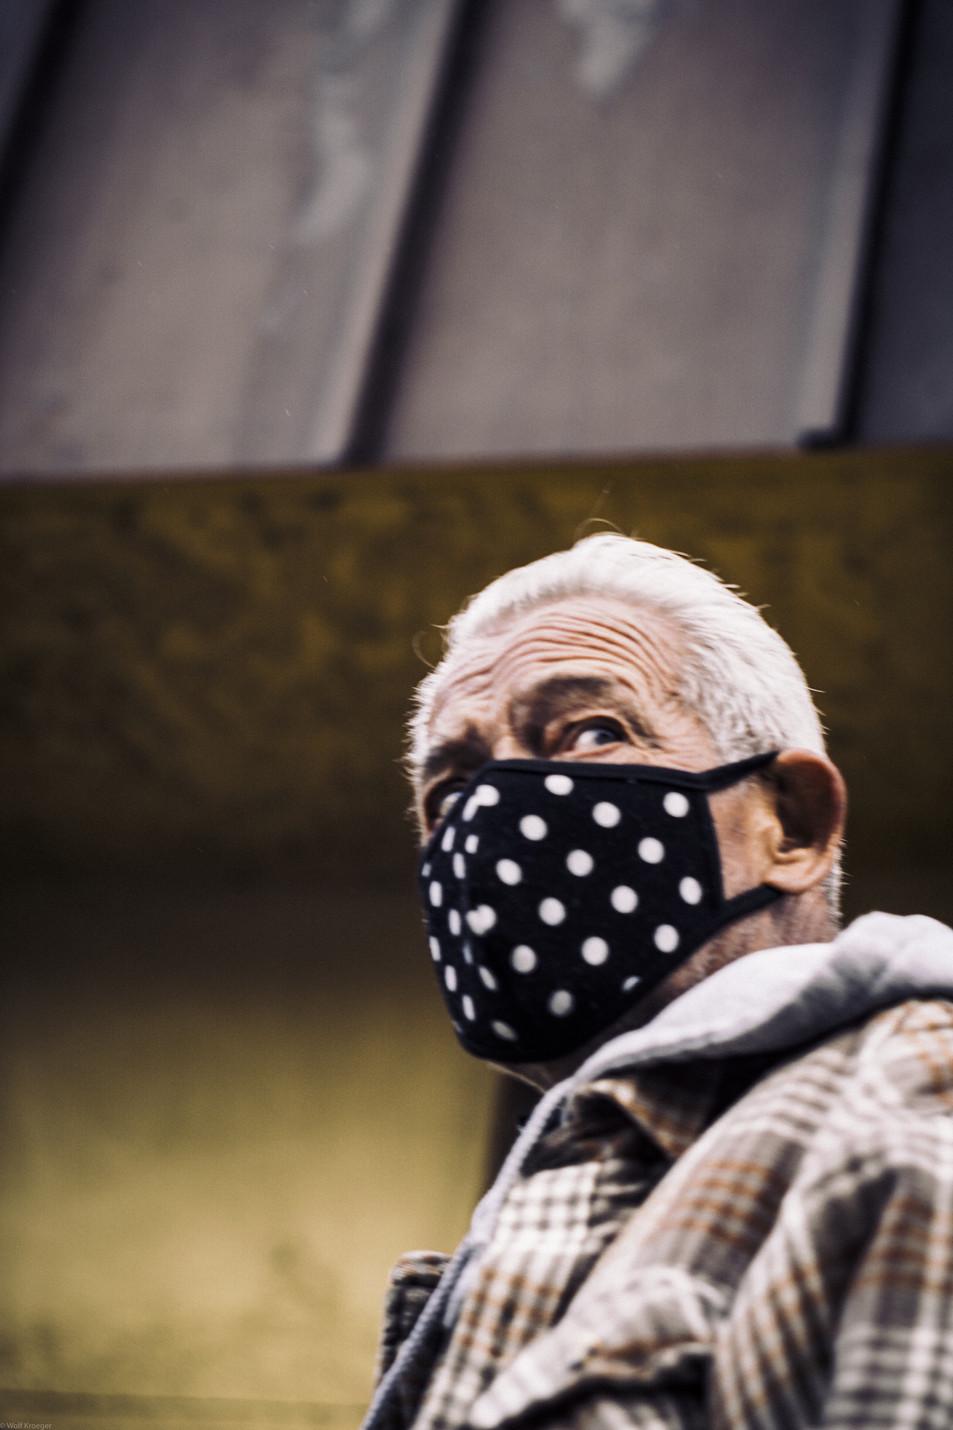 Scenes-Polka dots mask worn by an od-tim